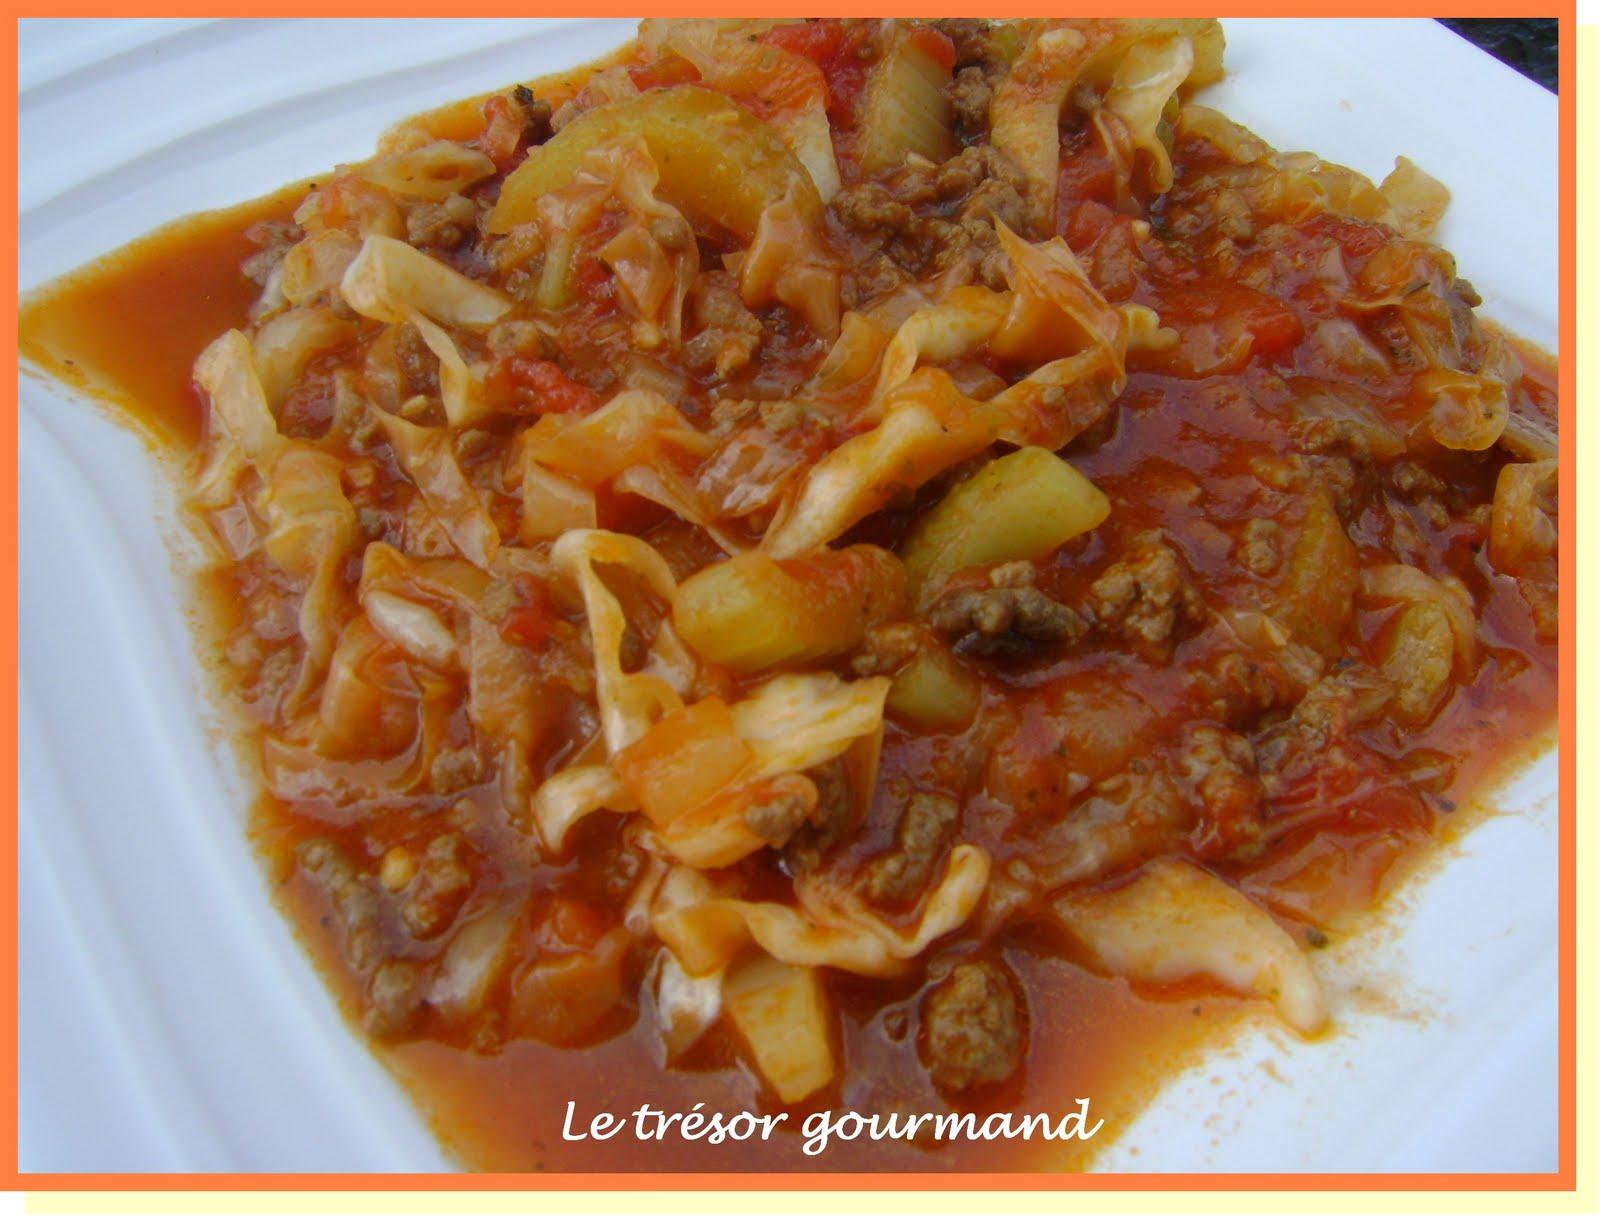 Le tr sor gourmand casserole de boeuf et chou - Se raser avec un coupe chou ...